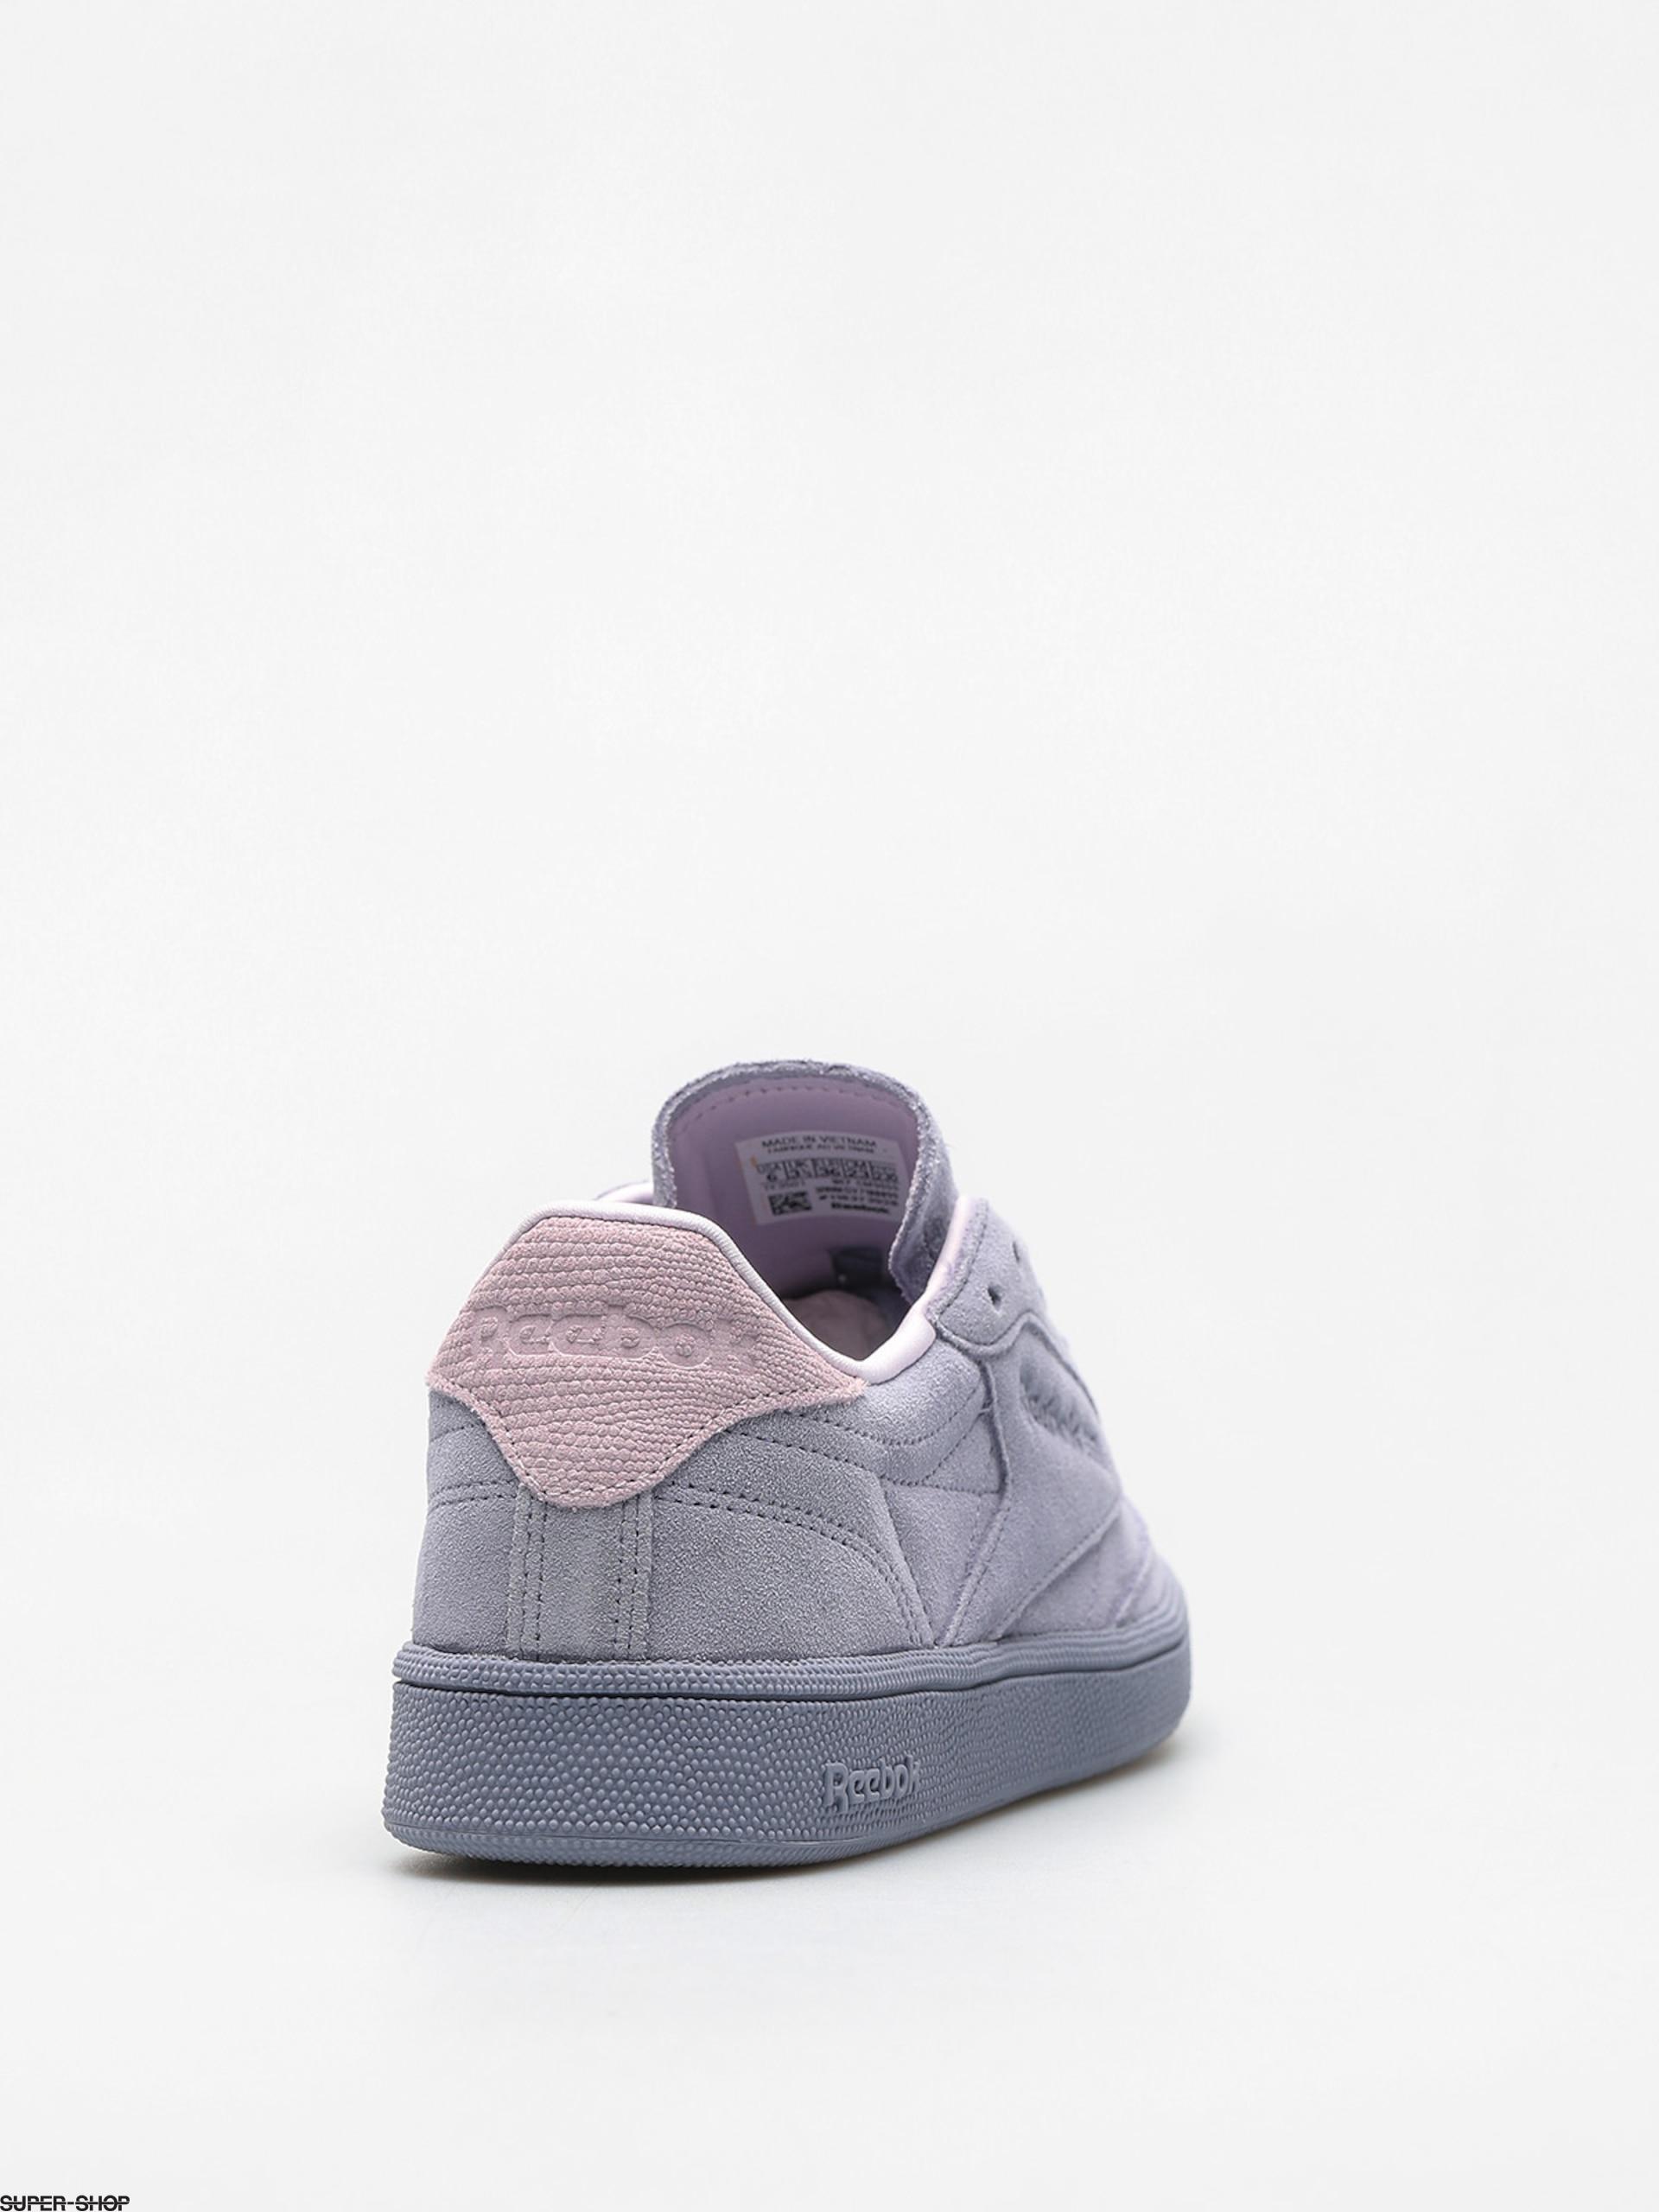 a1320dc87e1 Reebok Shoes Club C 85 Nbk Wmn (purple fog quartz)